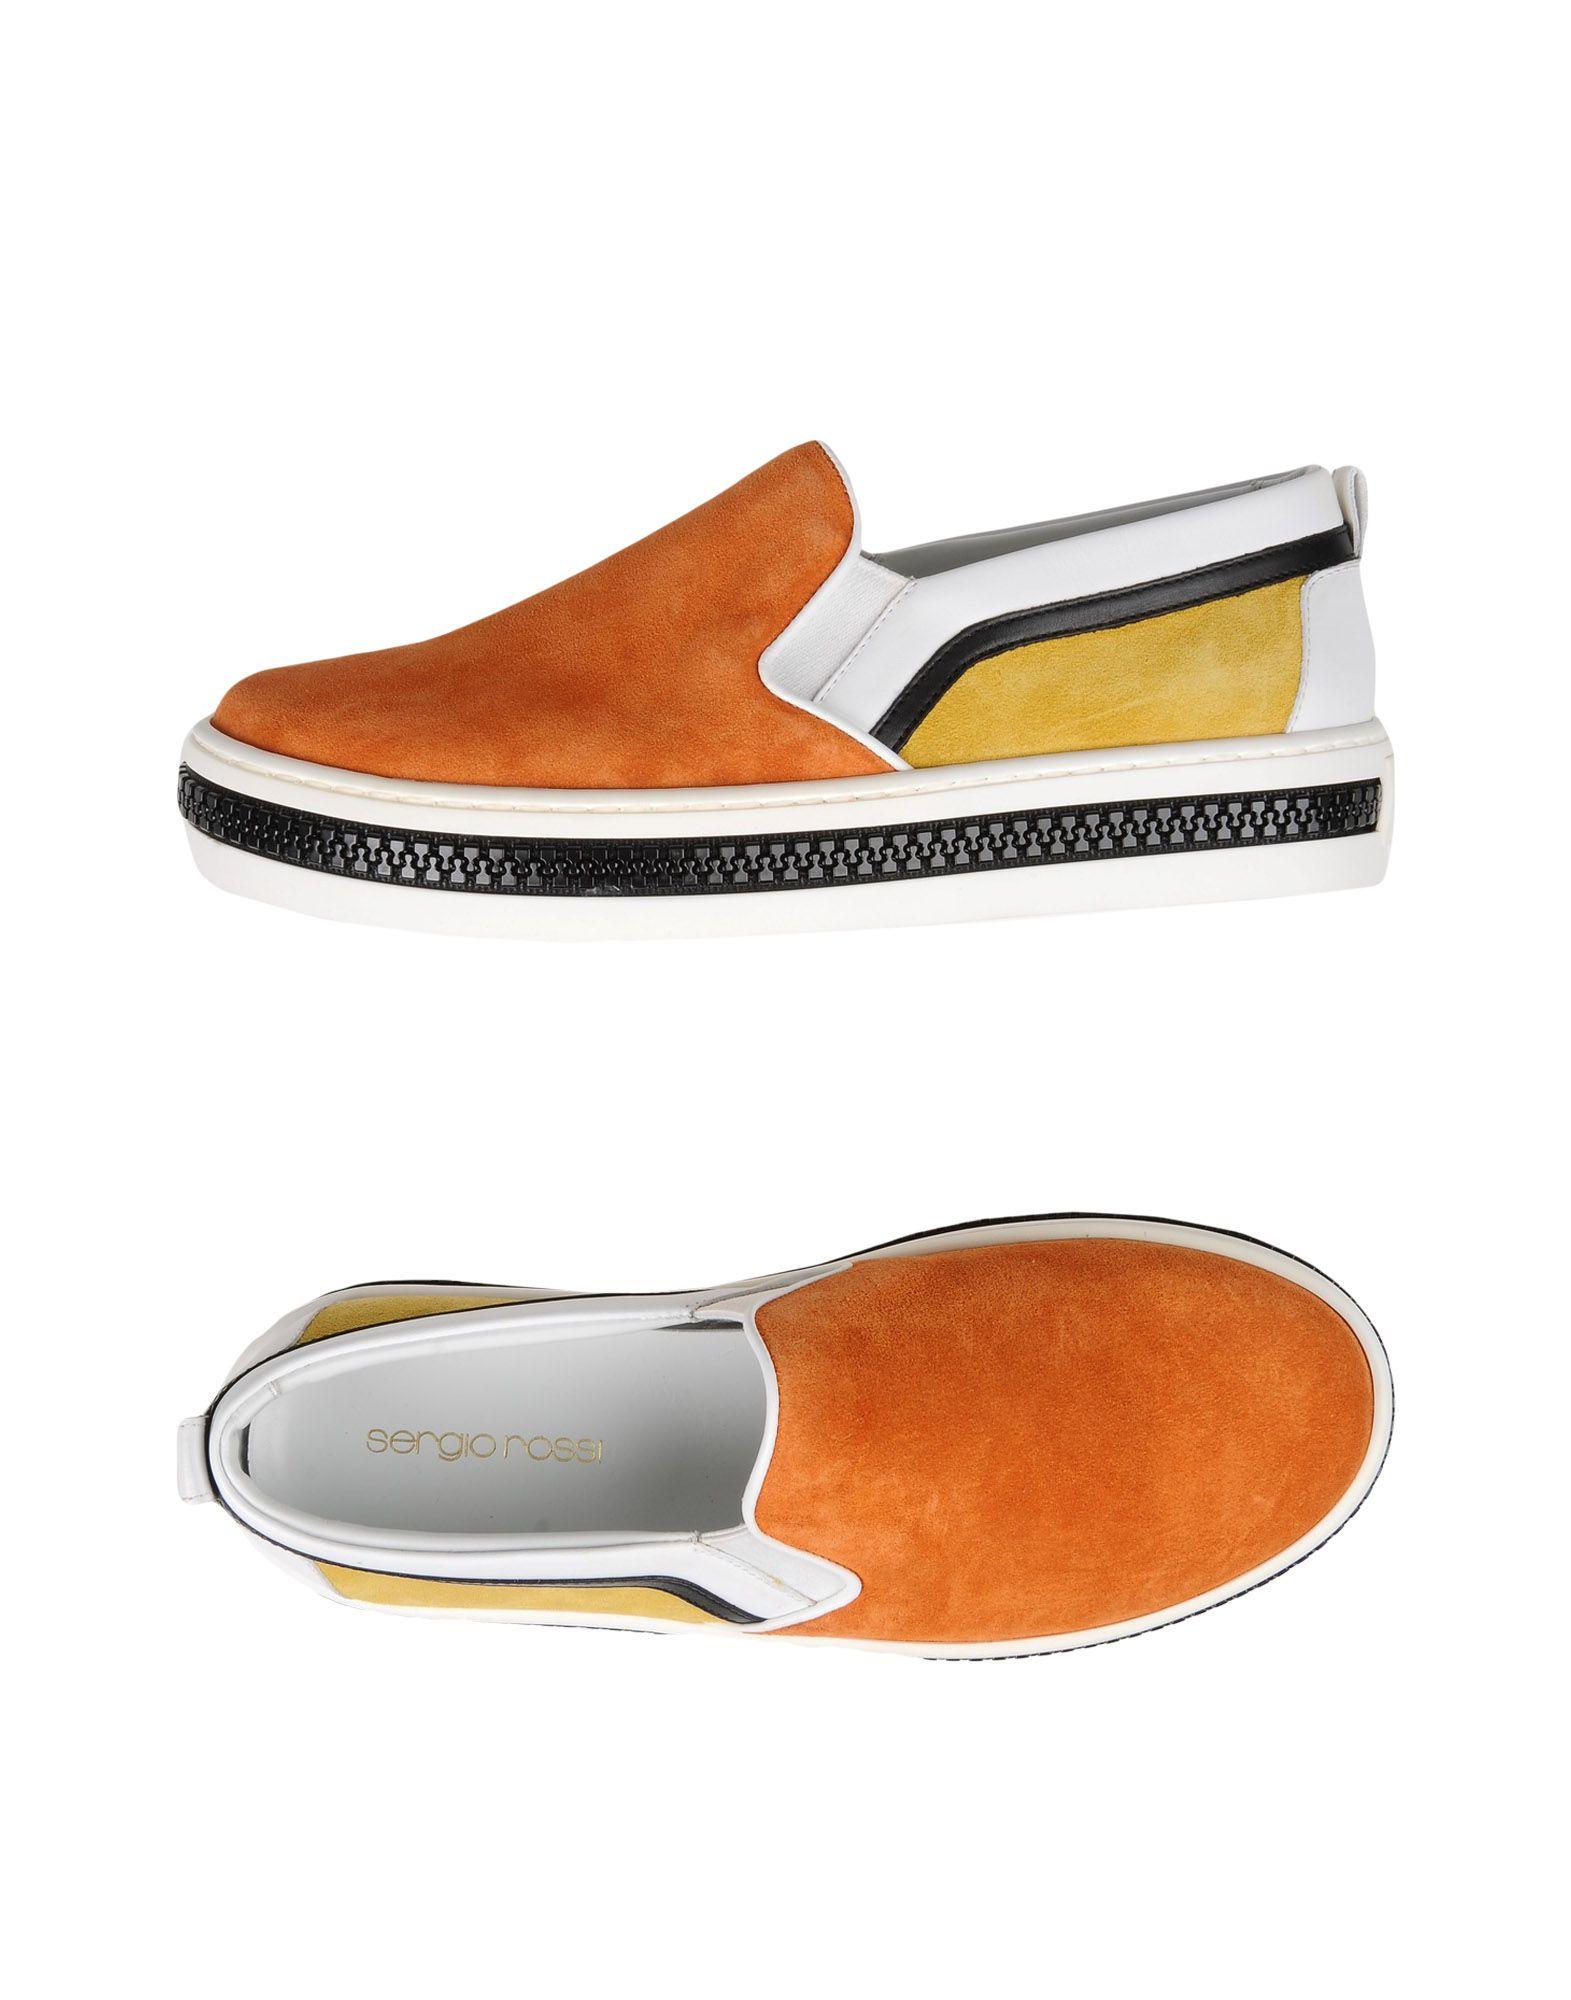 Zapatos mujer de mujer baratos zapatos de mujer Zapatos Zapatillas Sergio Rossi Mujer - Zapatillas Sergio Rossi  Naranja d62cbb